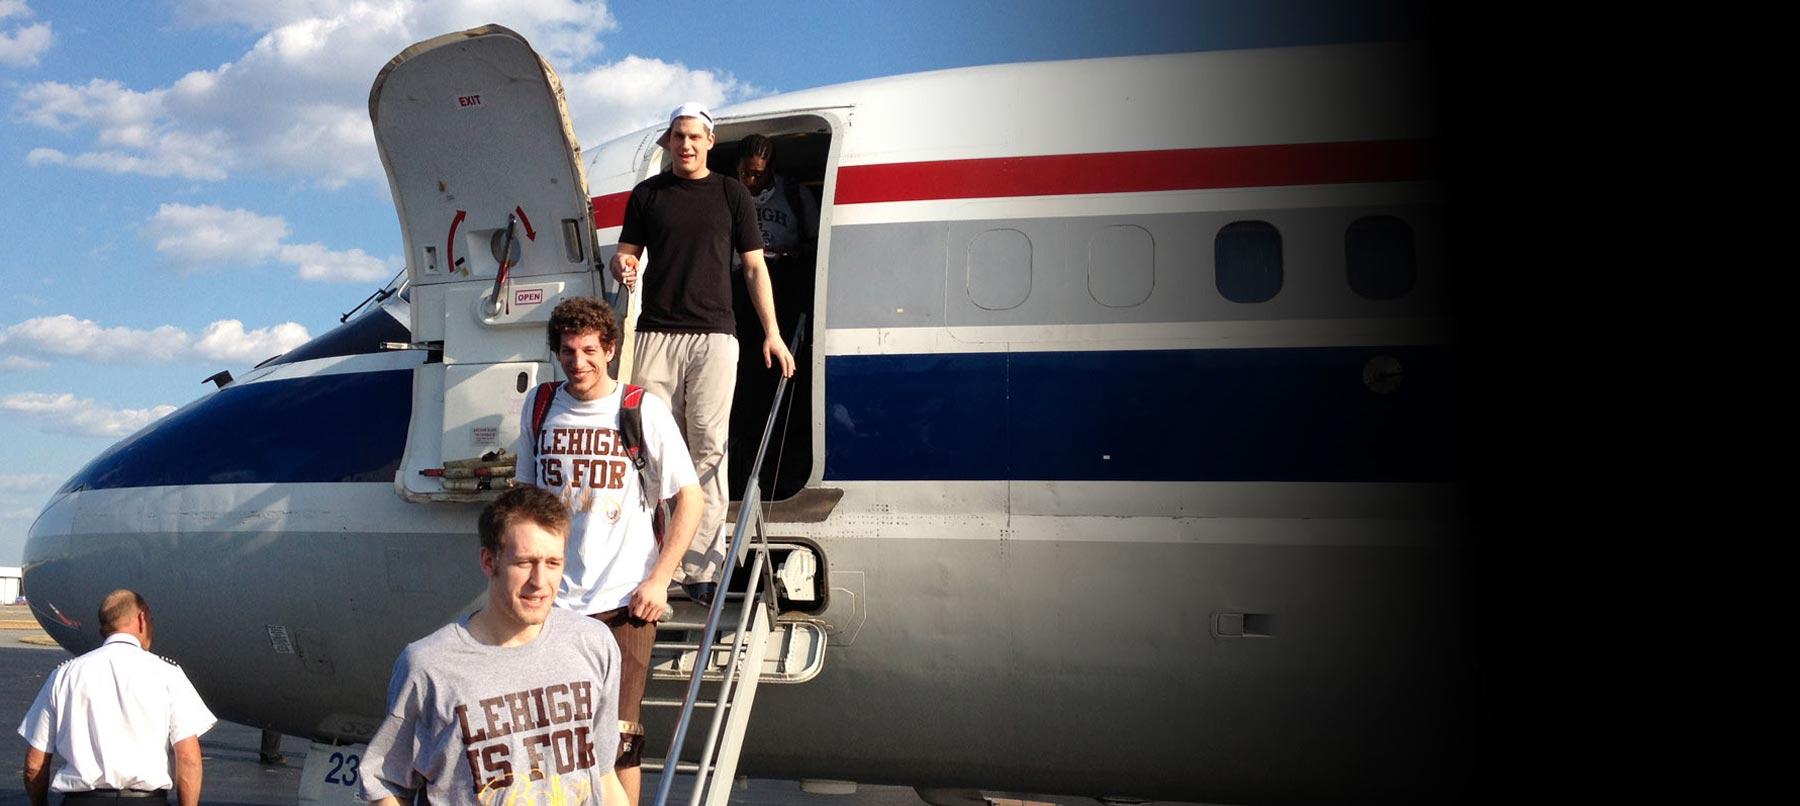 Lehigh University basketball players getting off plane